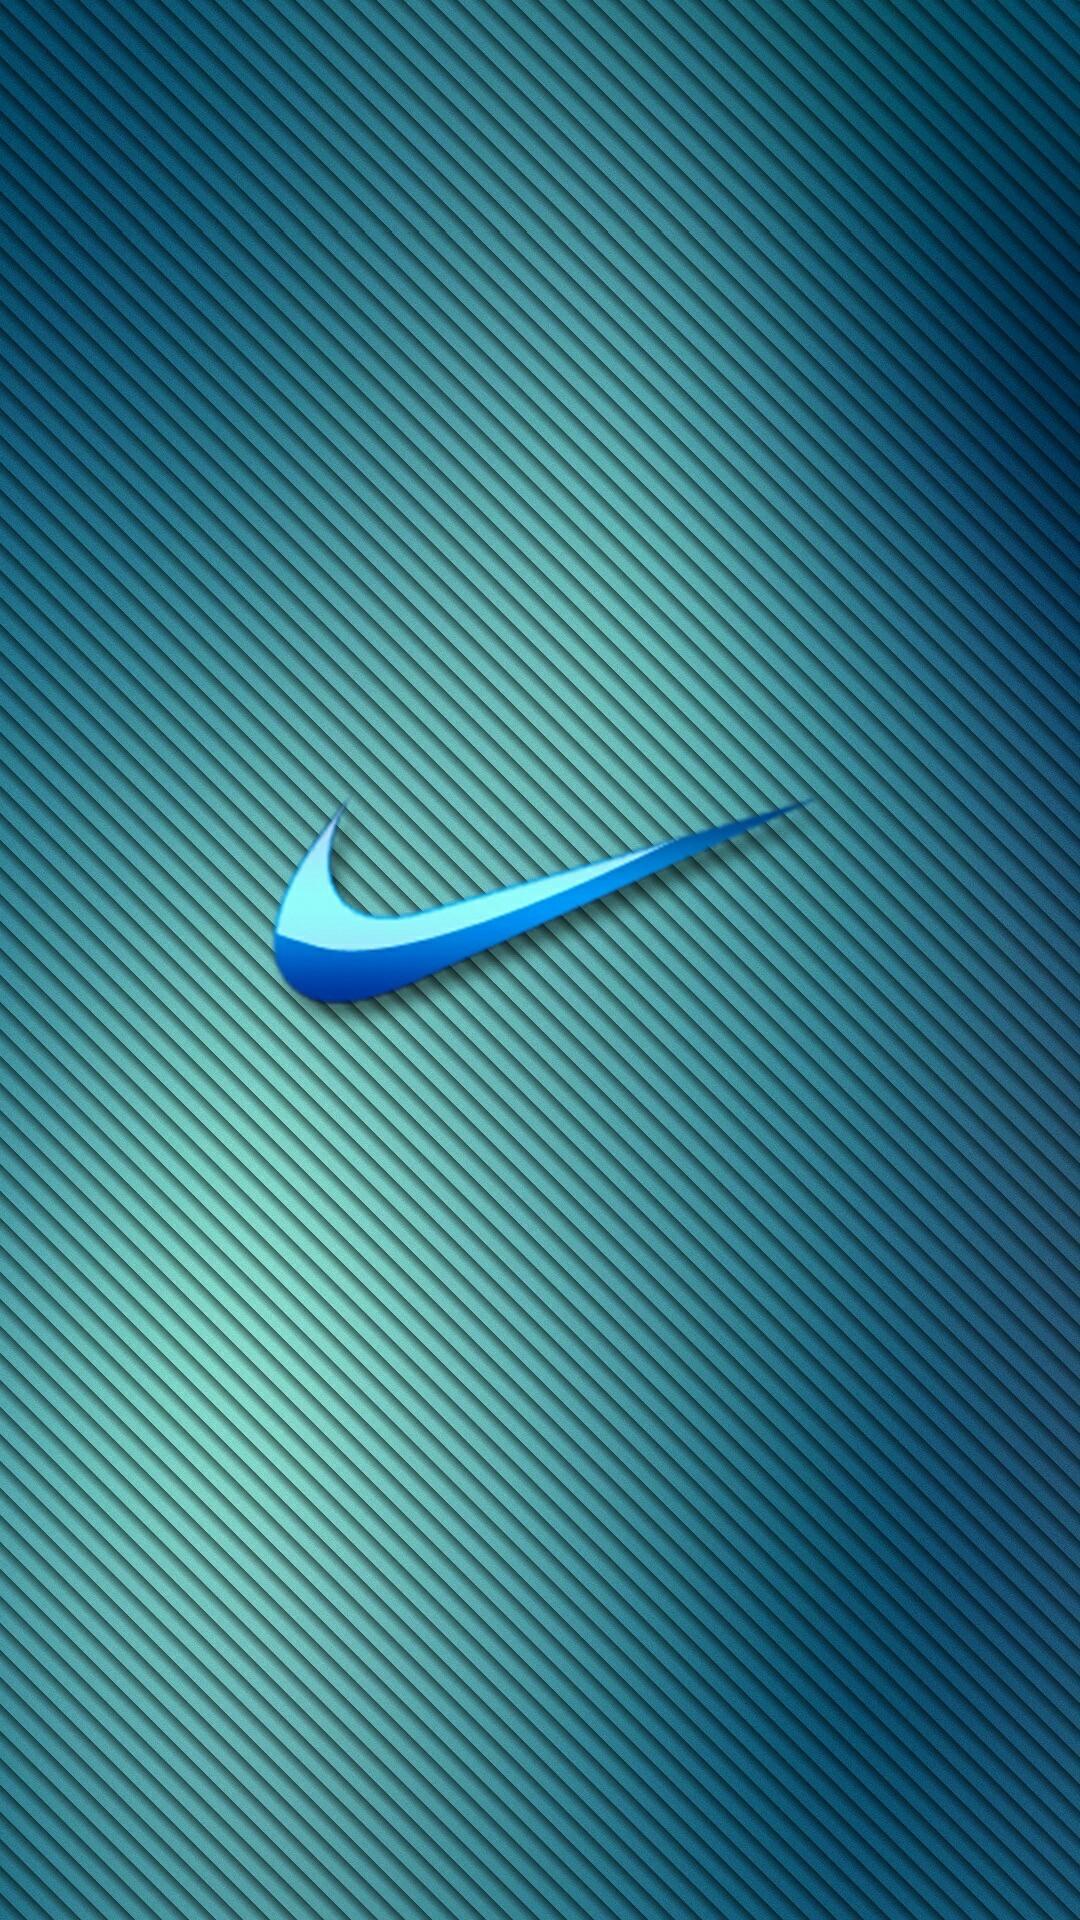 Nike Wallpaper, Adidas